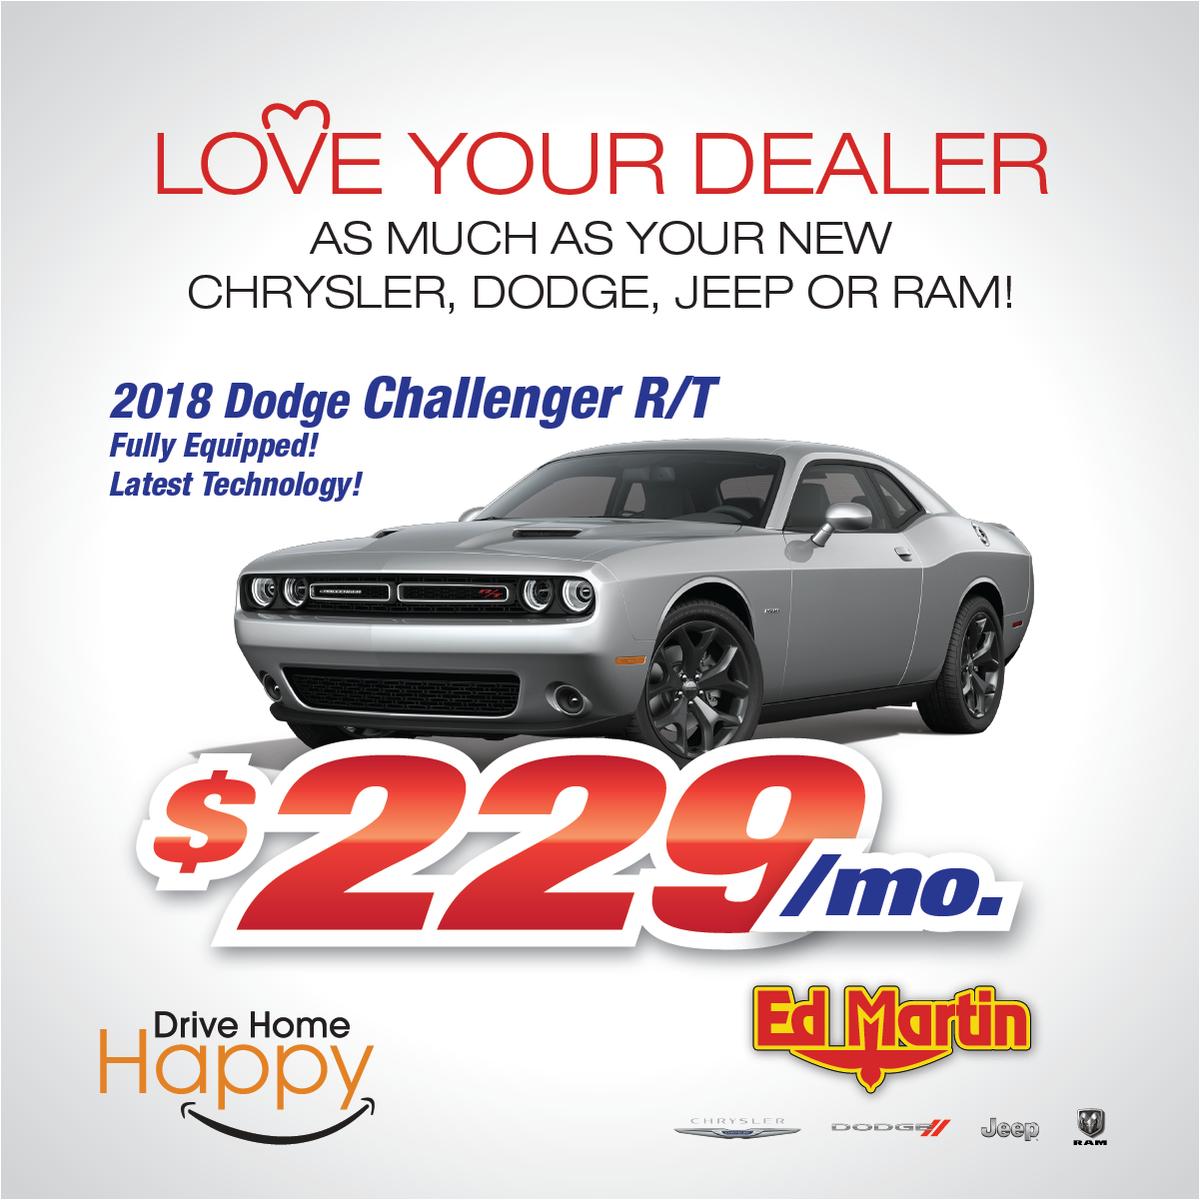 Ed Martin Chrysler Dodge Jeep Ram - 2017 Dodge Charger